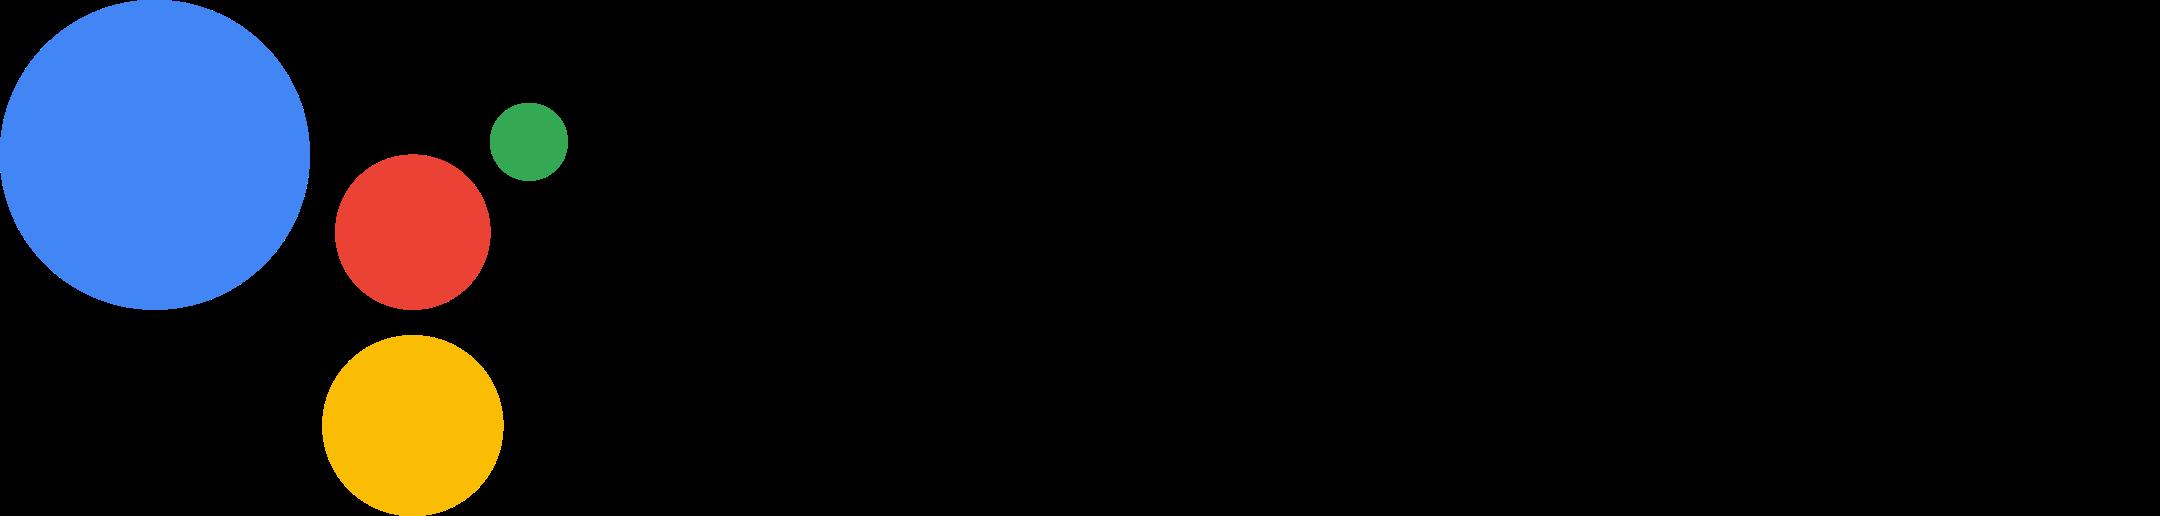 ok google logo 1 - Ok Google Logo